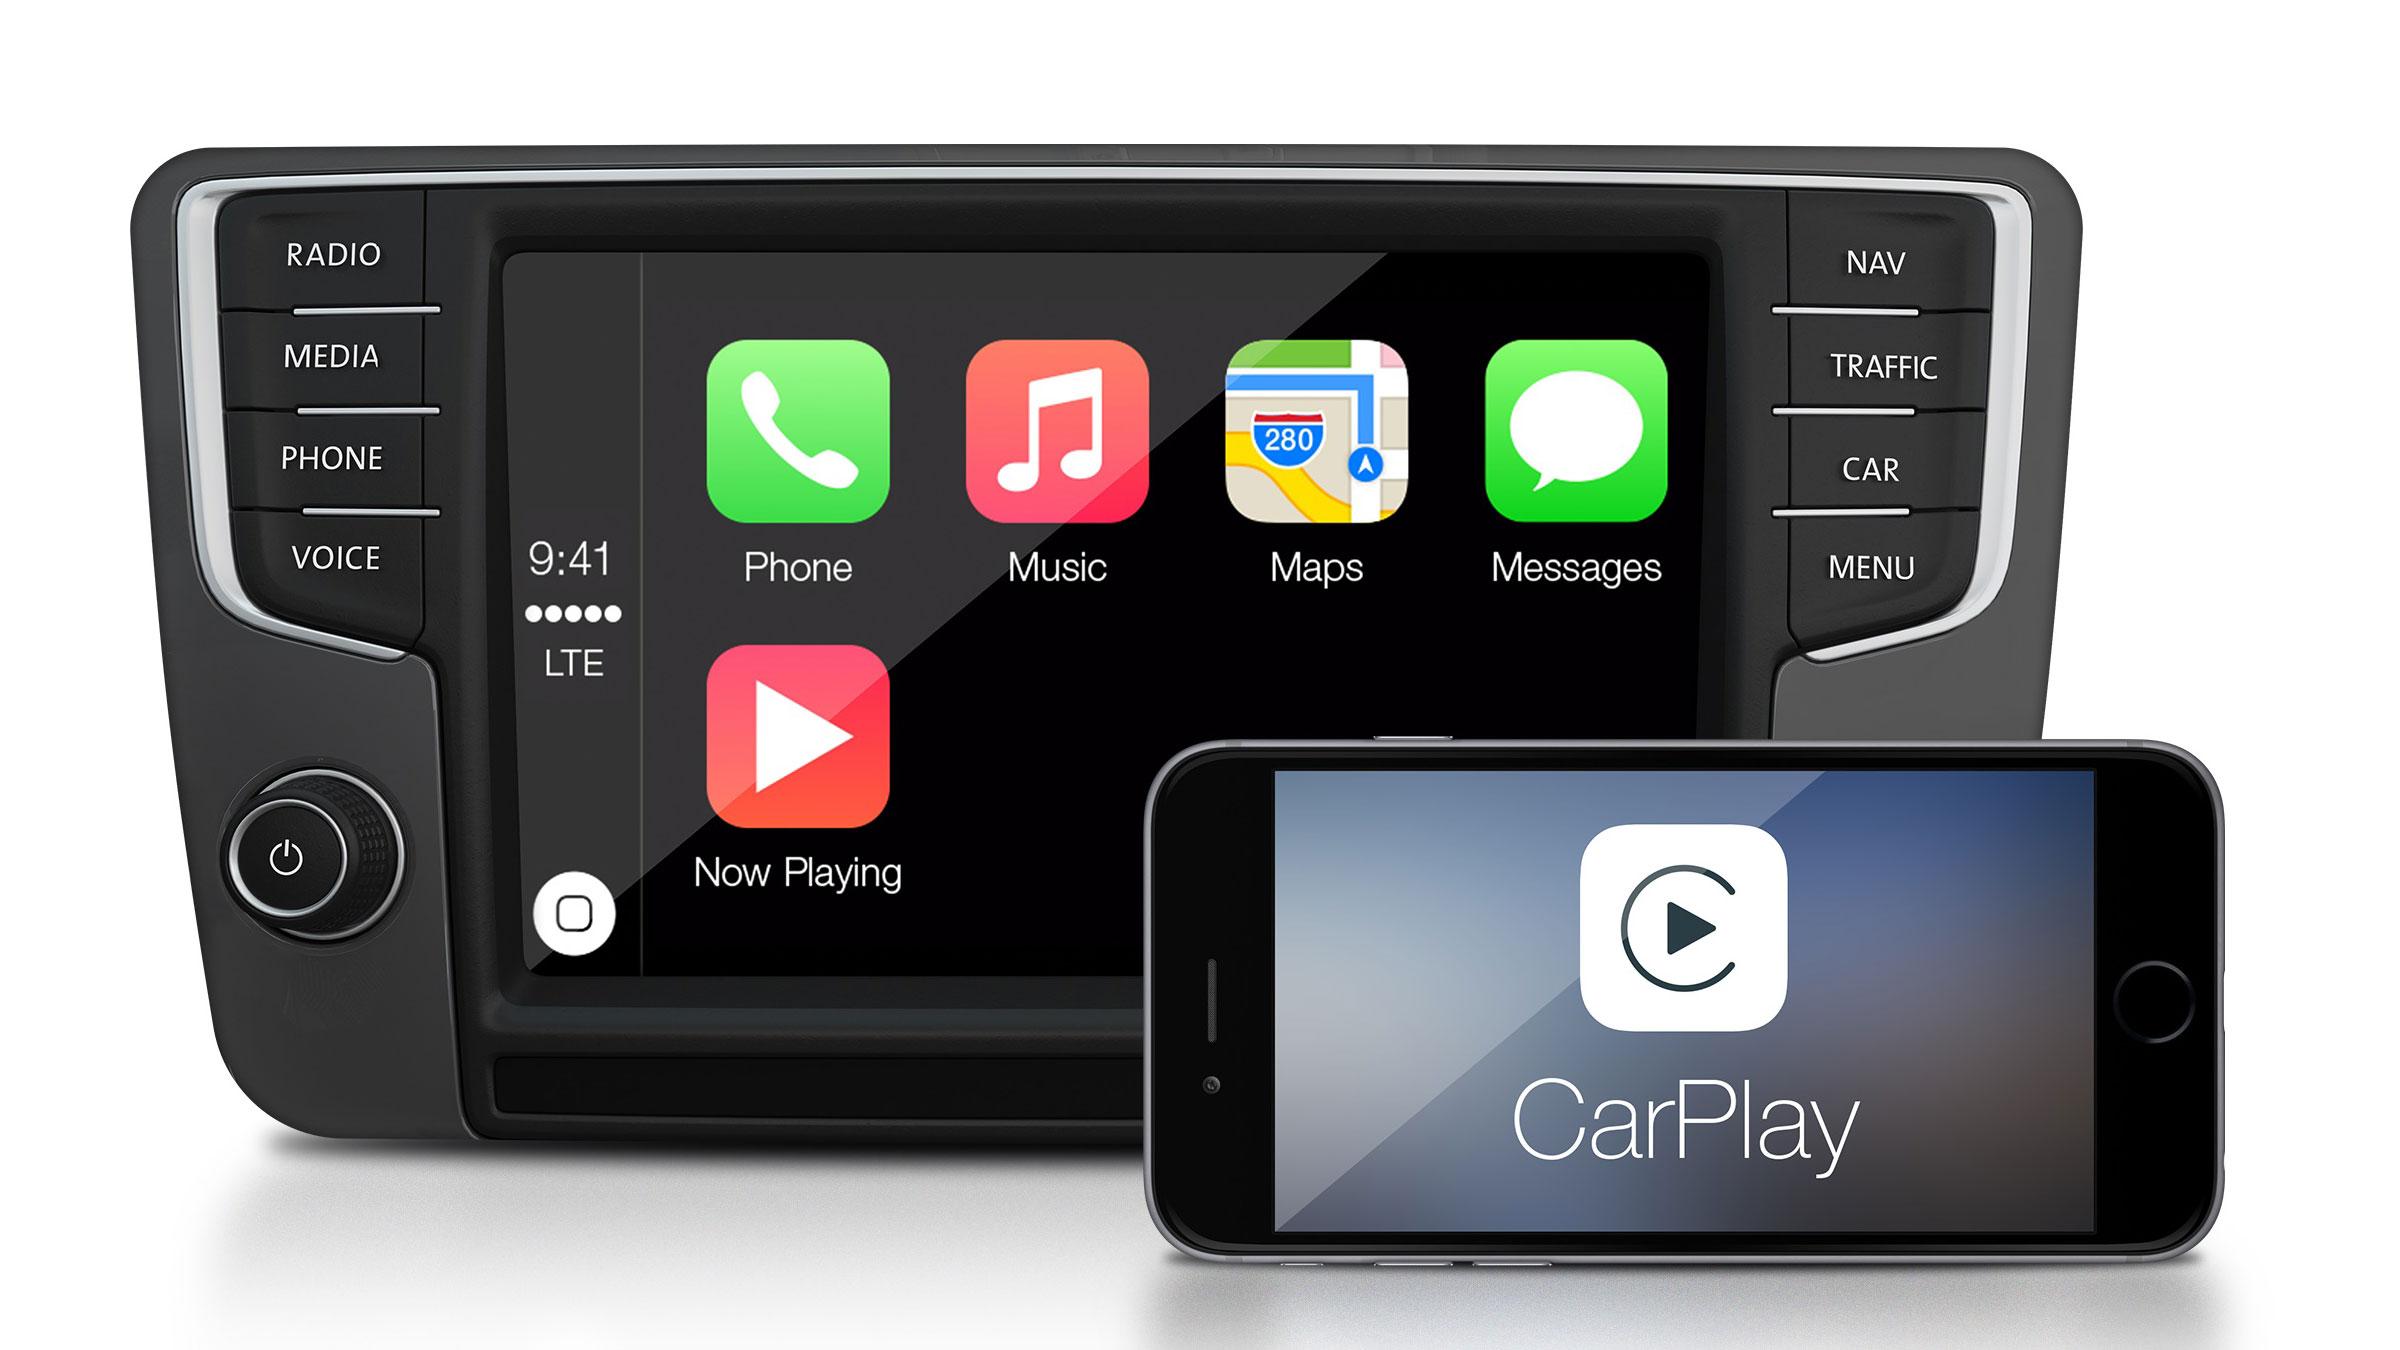 apple carplay kompatible automodelle in deutschland news. Black Bedroom Furniture Sets. Home Design Ideas